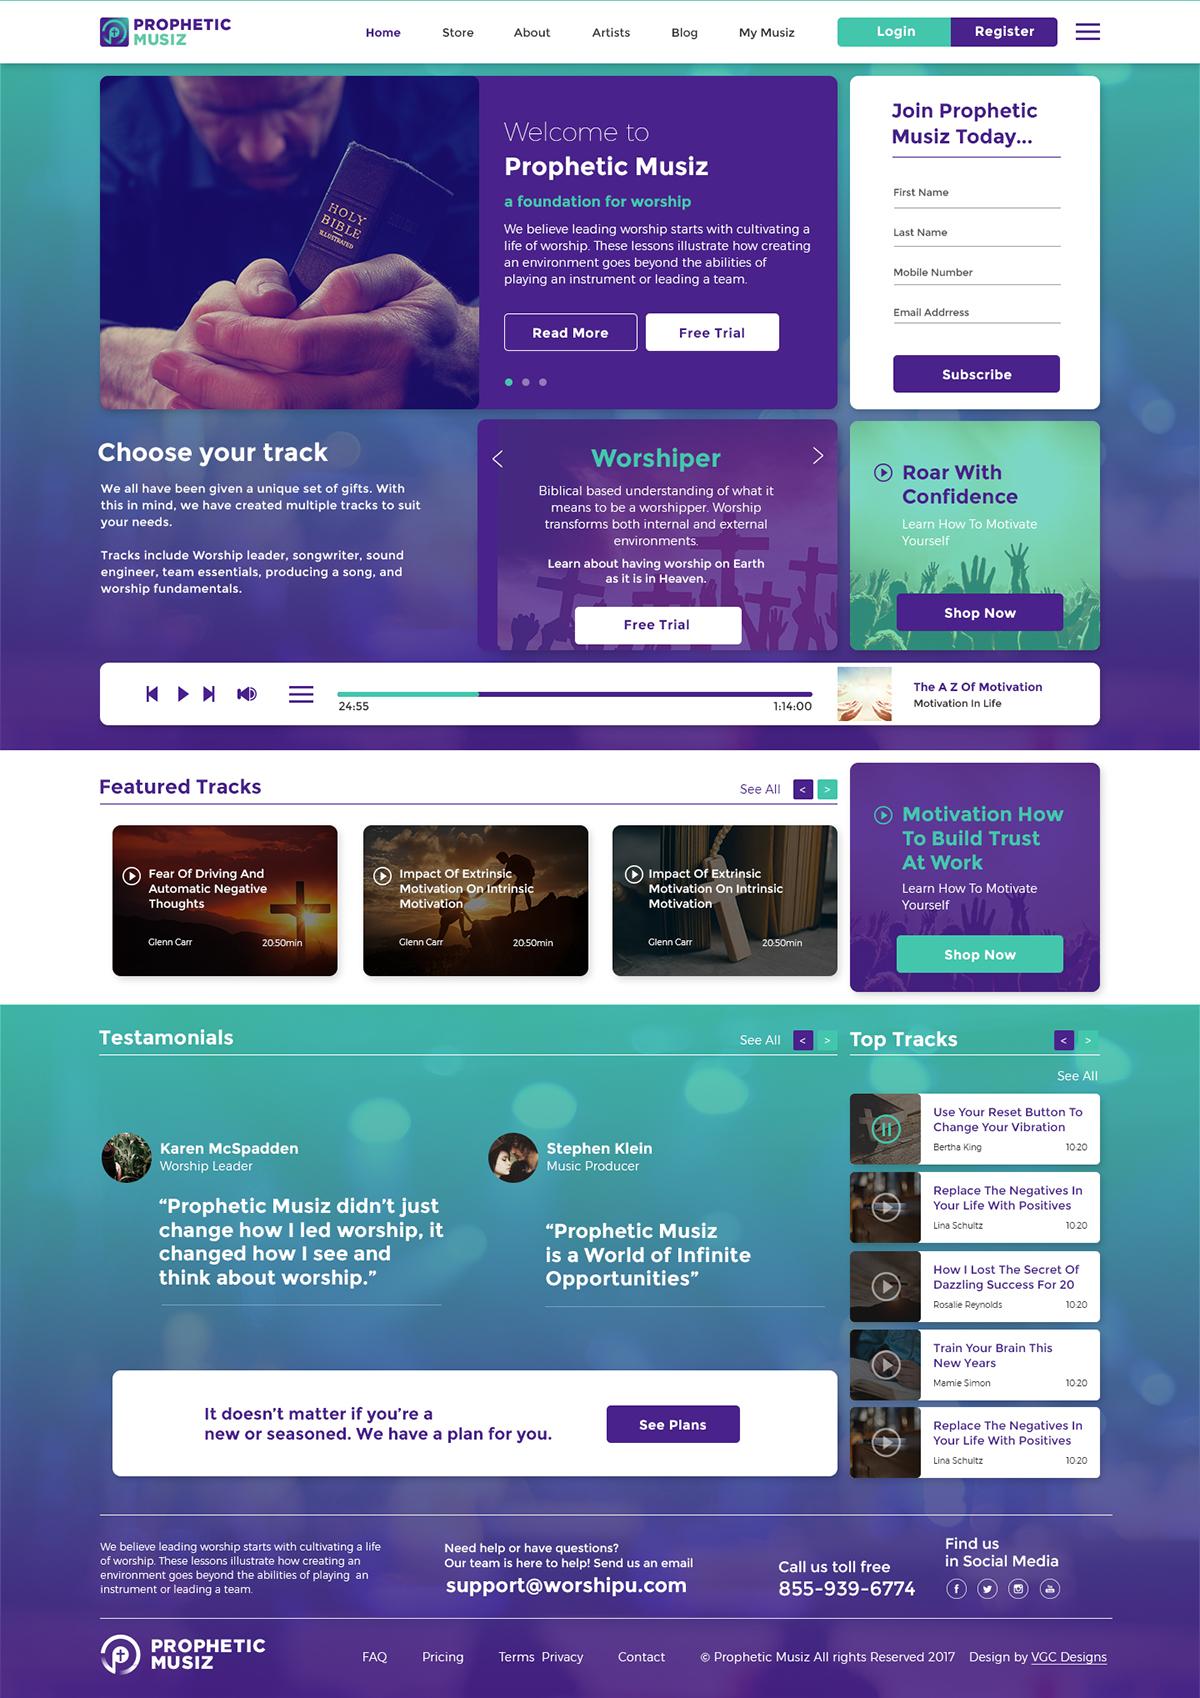 ZOE Ministries - Prophetic Musiz Website & Brand Identity design interaction ui design UX design brand identity church music church